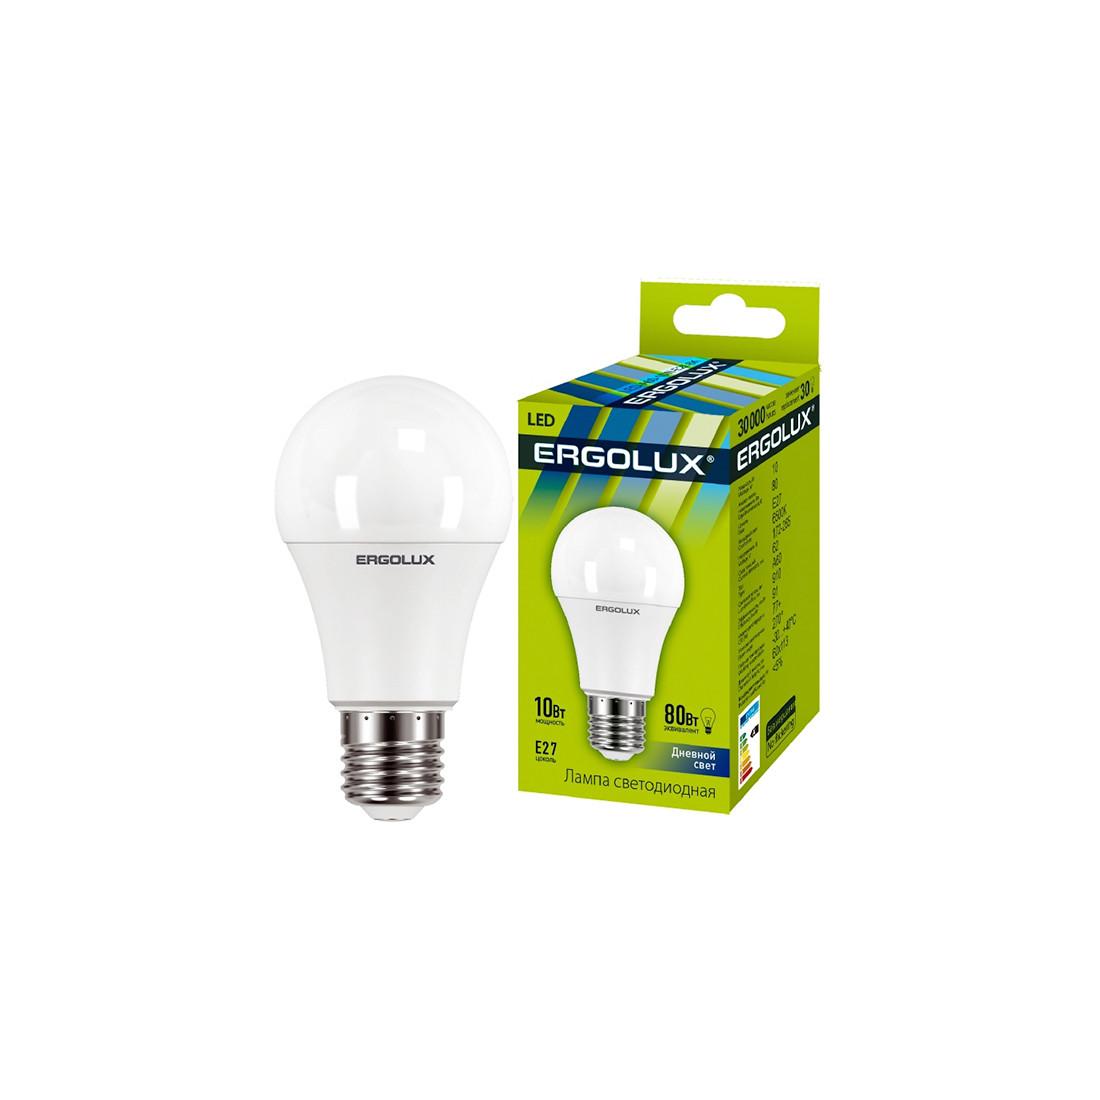 Эл. лампа светодиодная Ergolux LED-A60-10W-E27-6K, Дневной